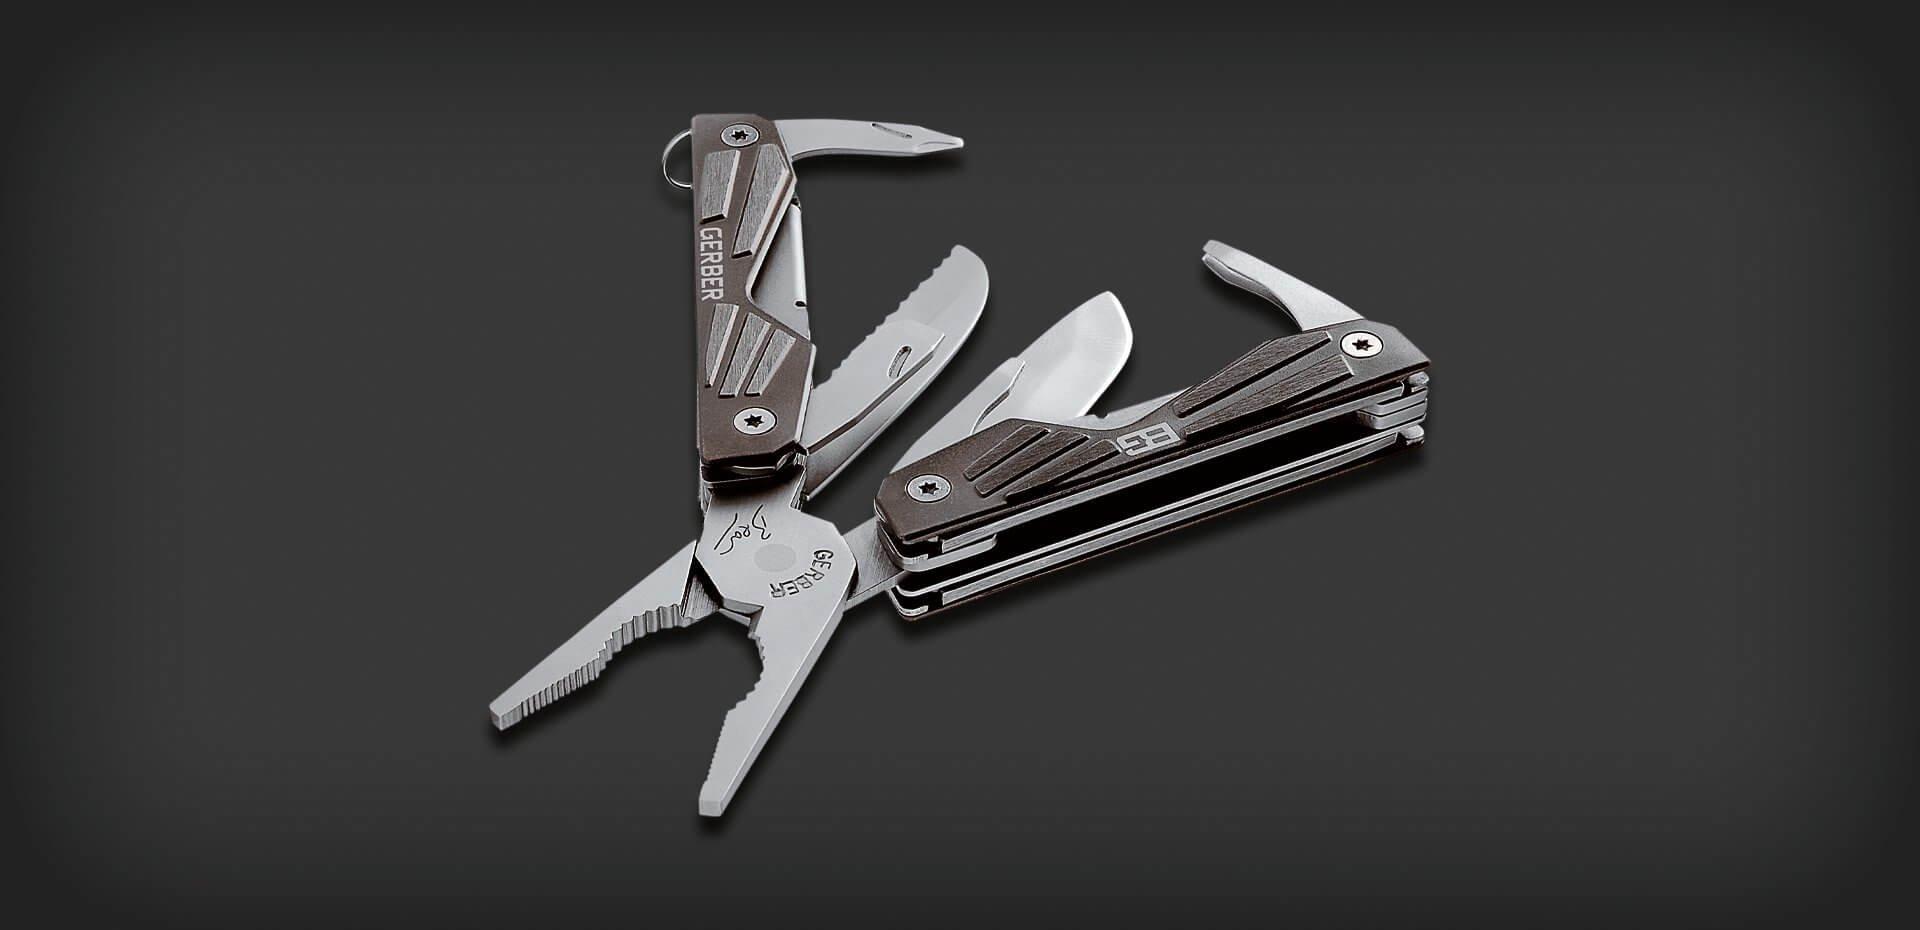 Bear-Grylls-Compact-Multi-tool_fulljpg